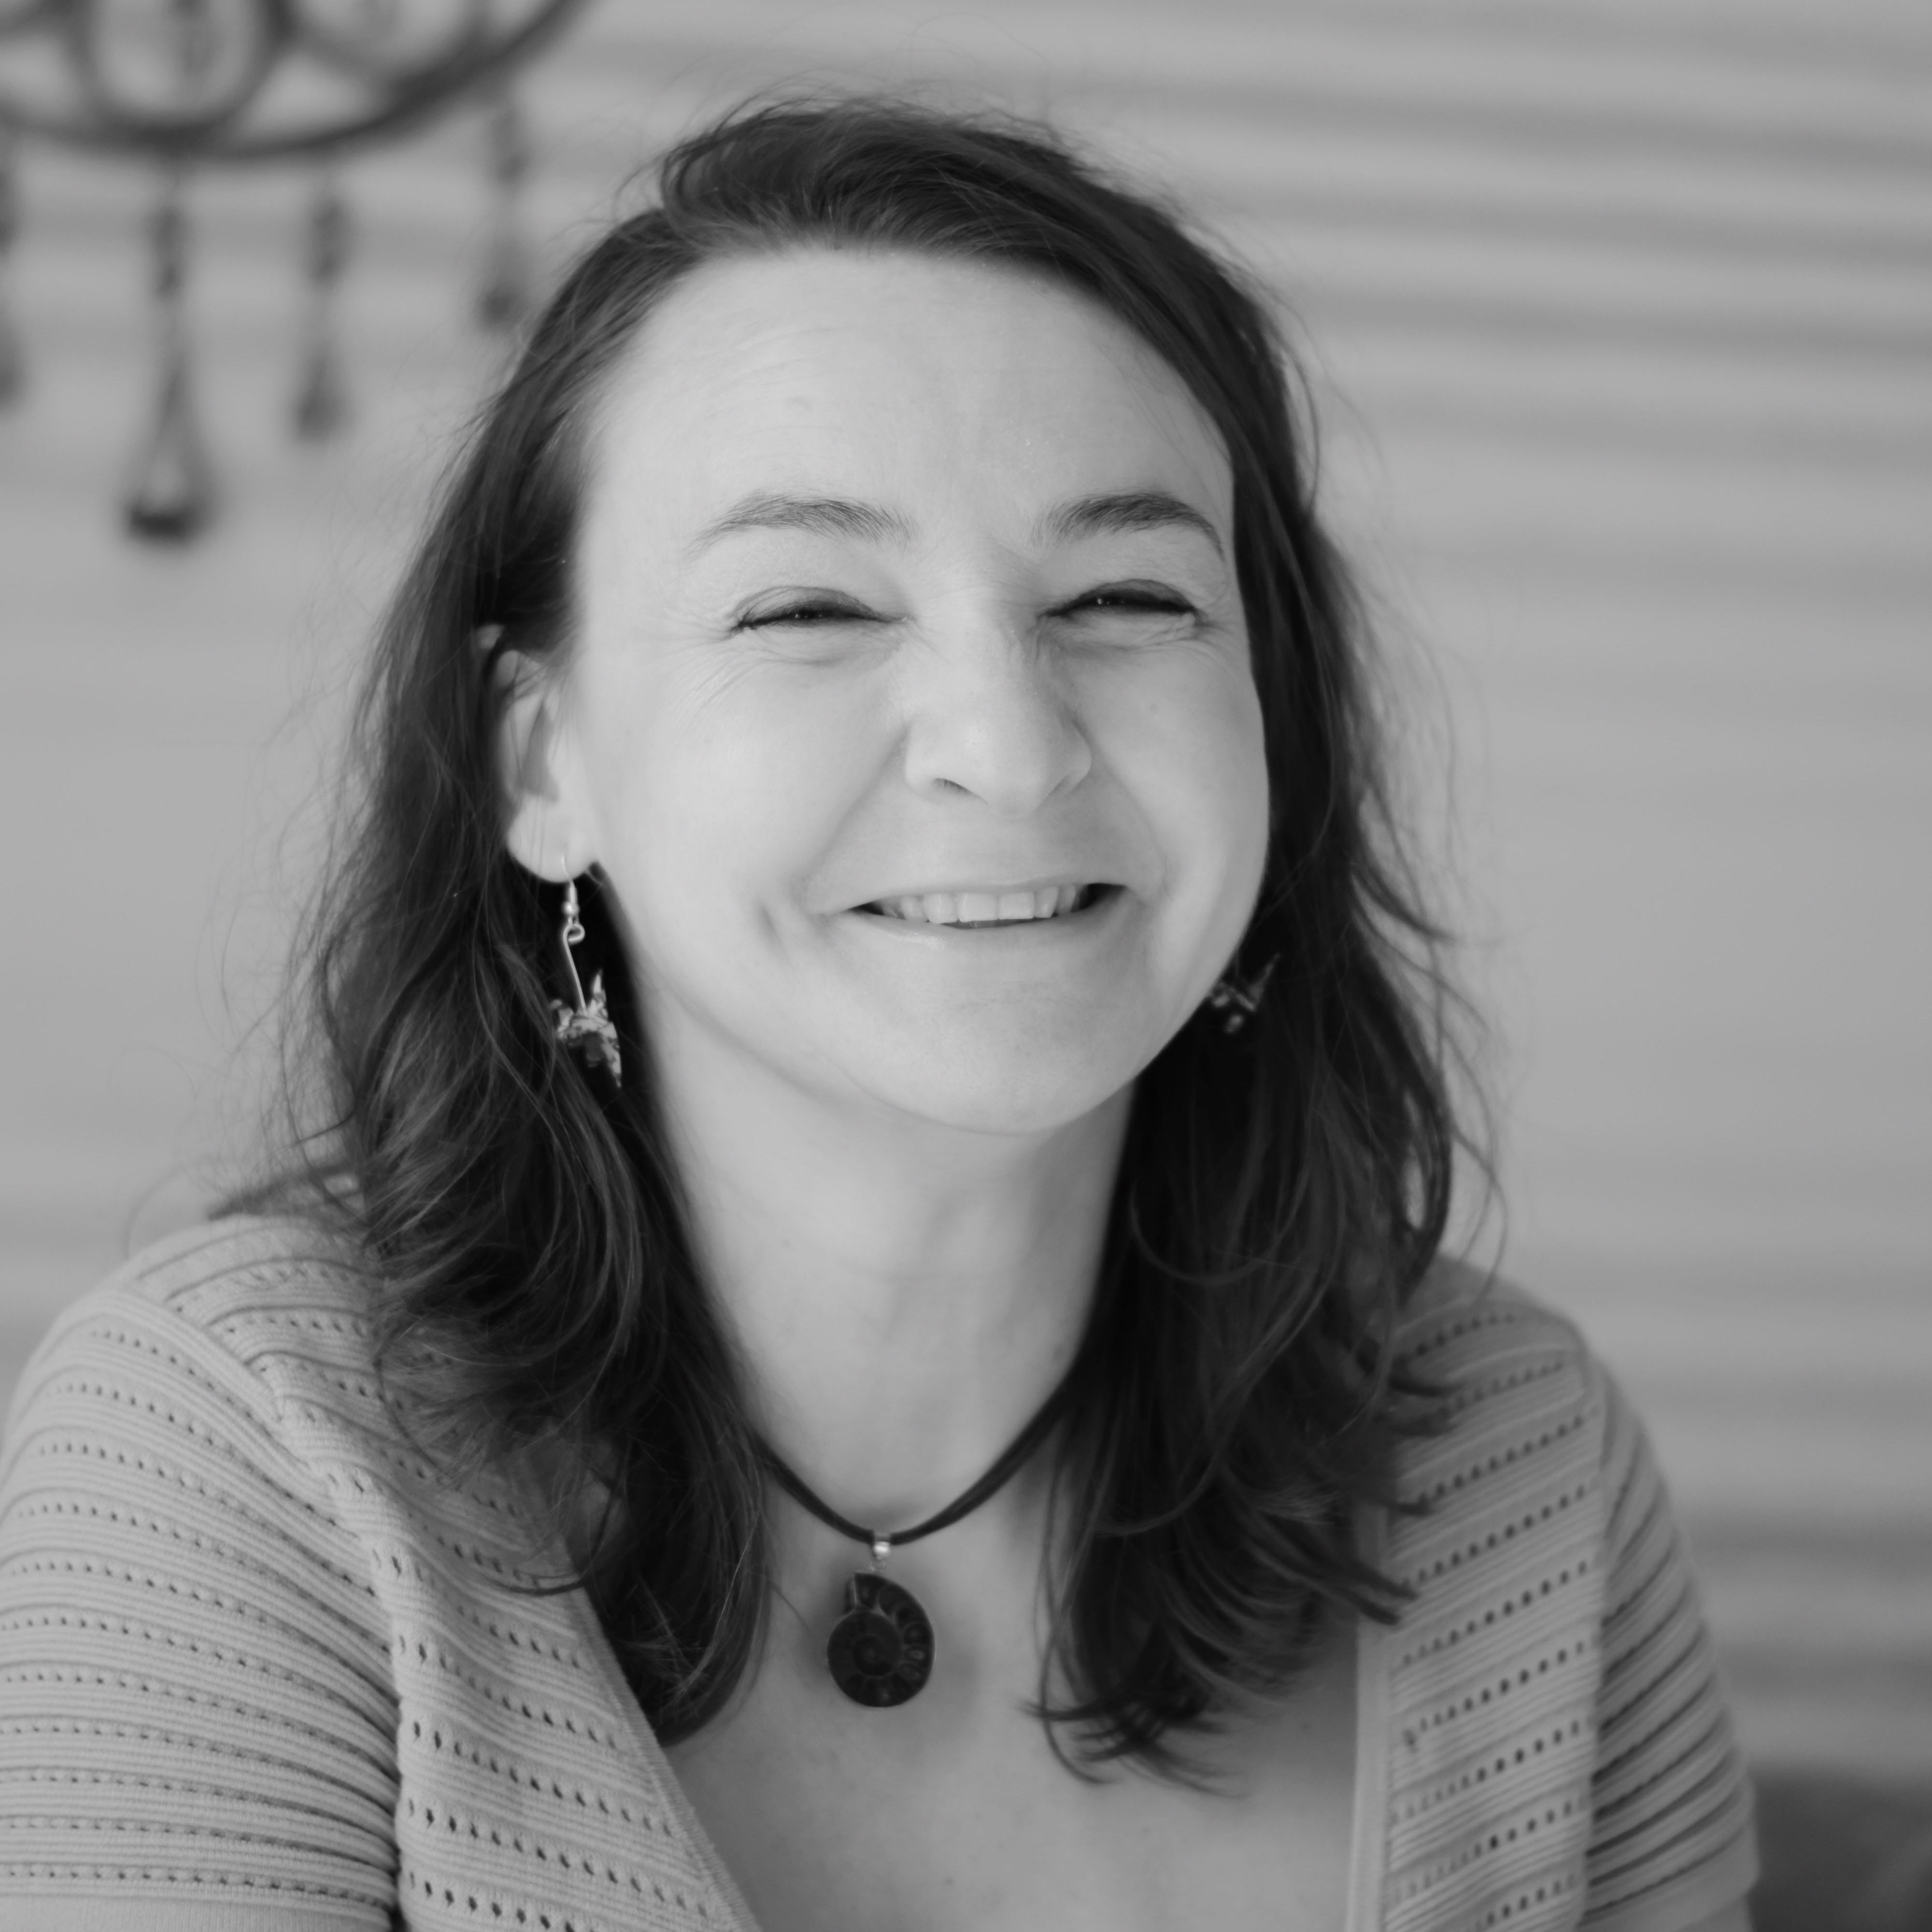 Gestion du stress, thérapie brève Lagny-sur-Marne - Christine Camelot - Sophro-analyse